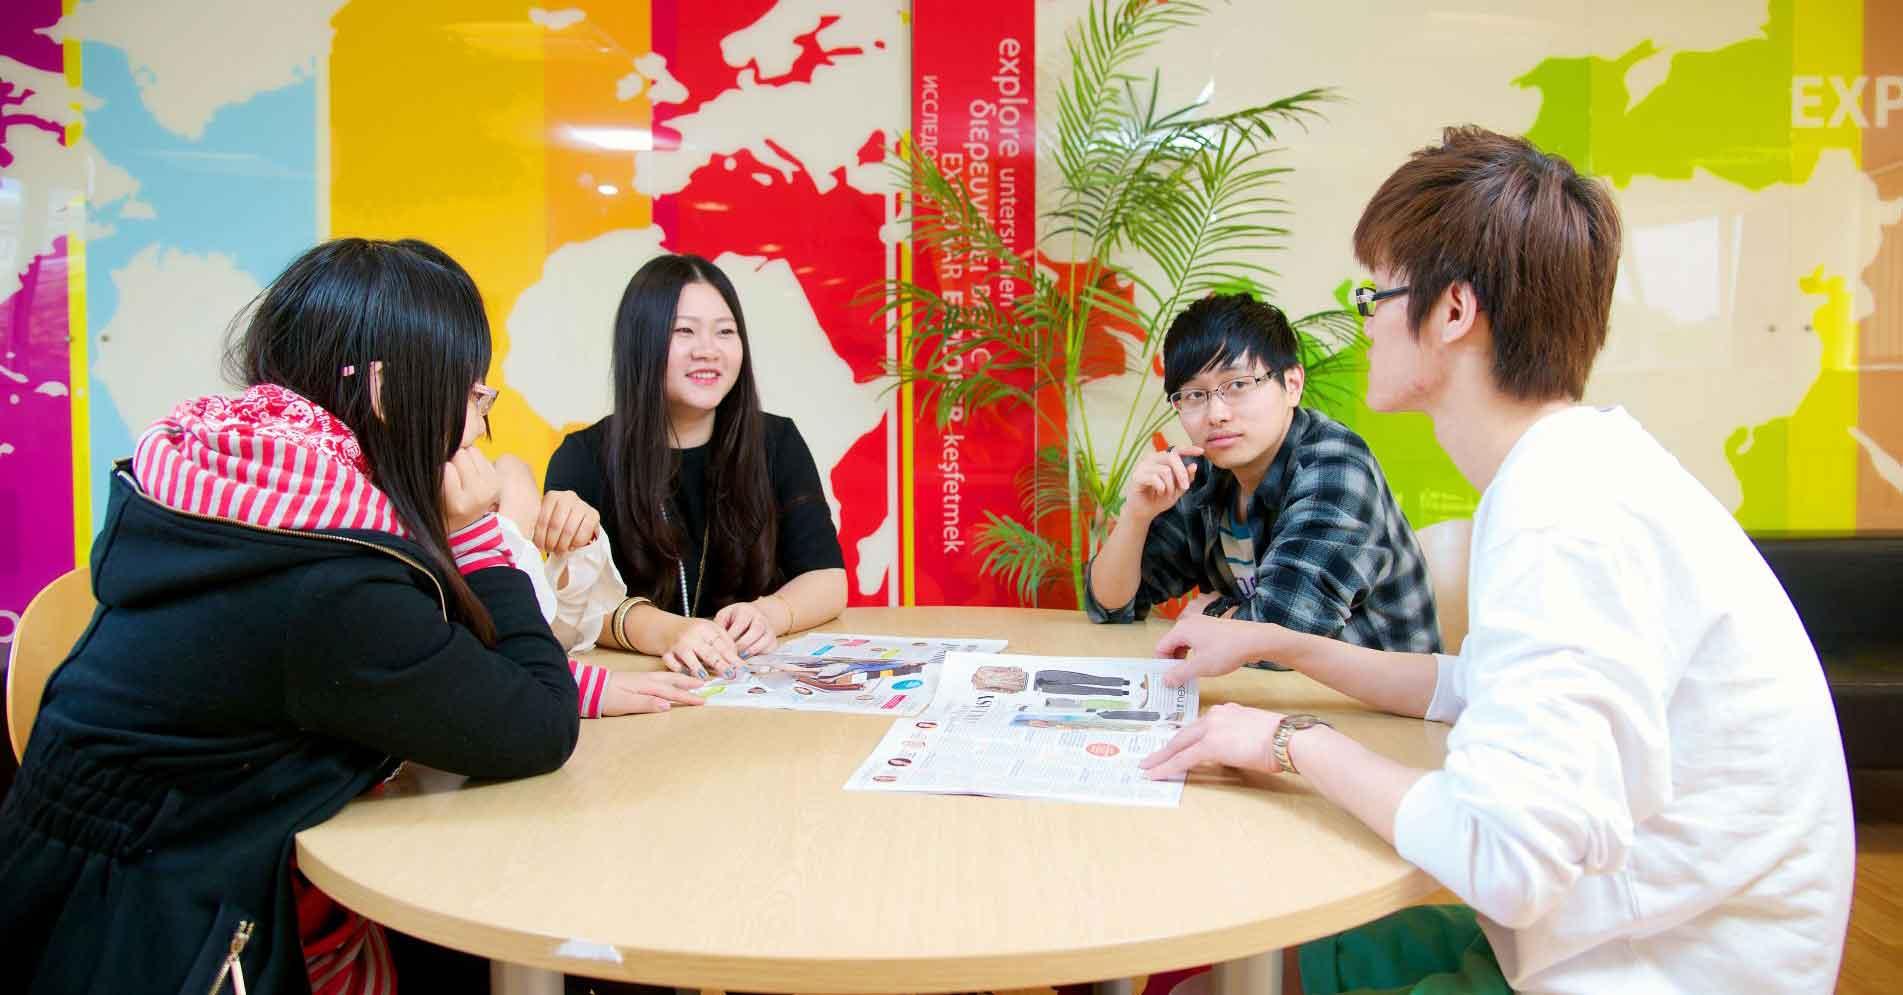 Key intercultural business communication resources